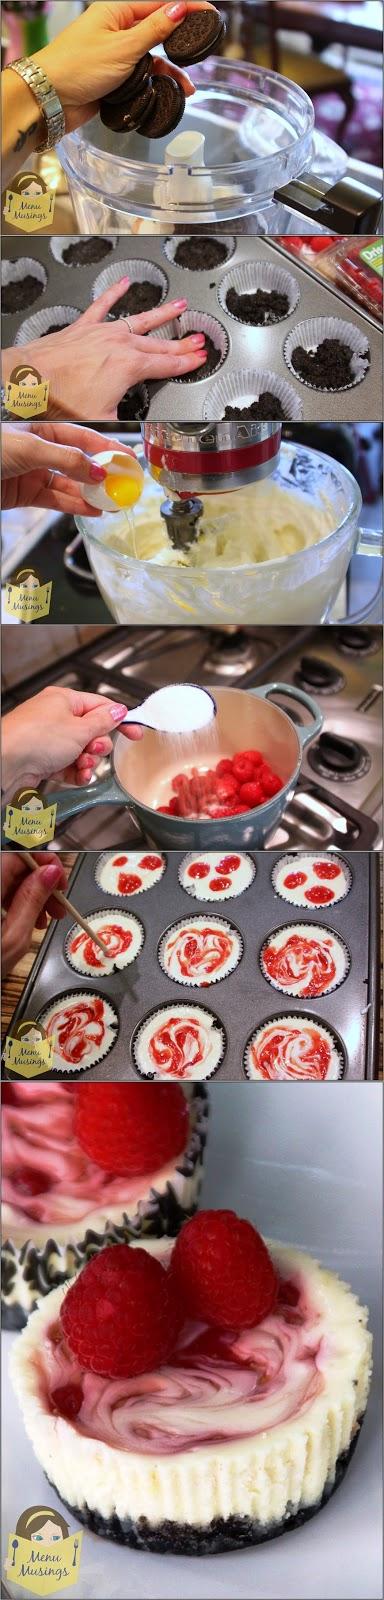 http://menumusings.blogspot.com/2013/07/raspberry-swirl-cheesecake-minis.html